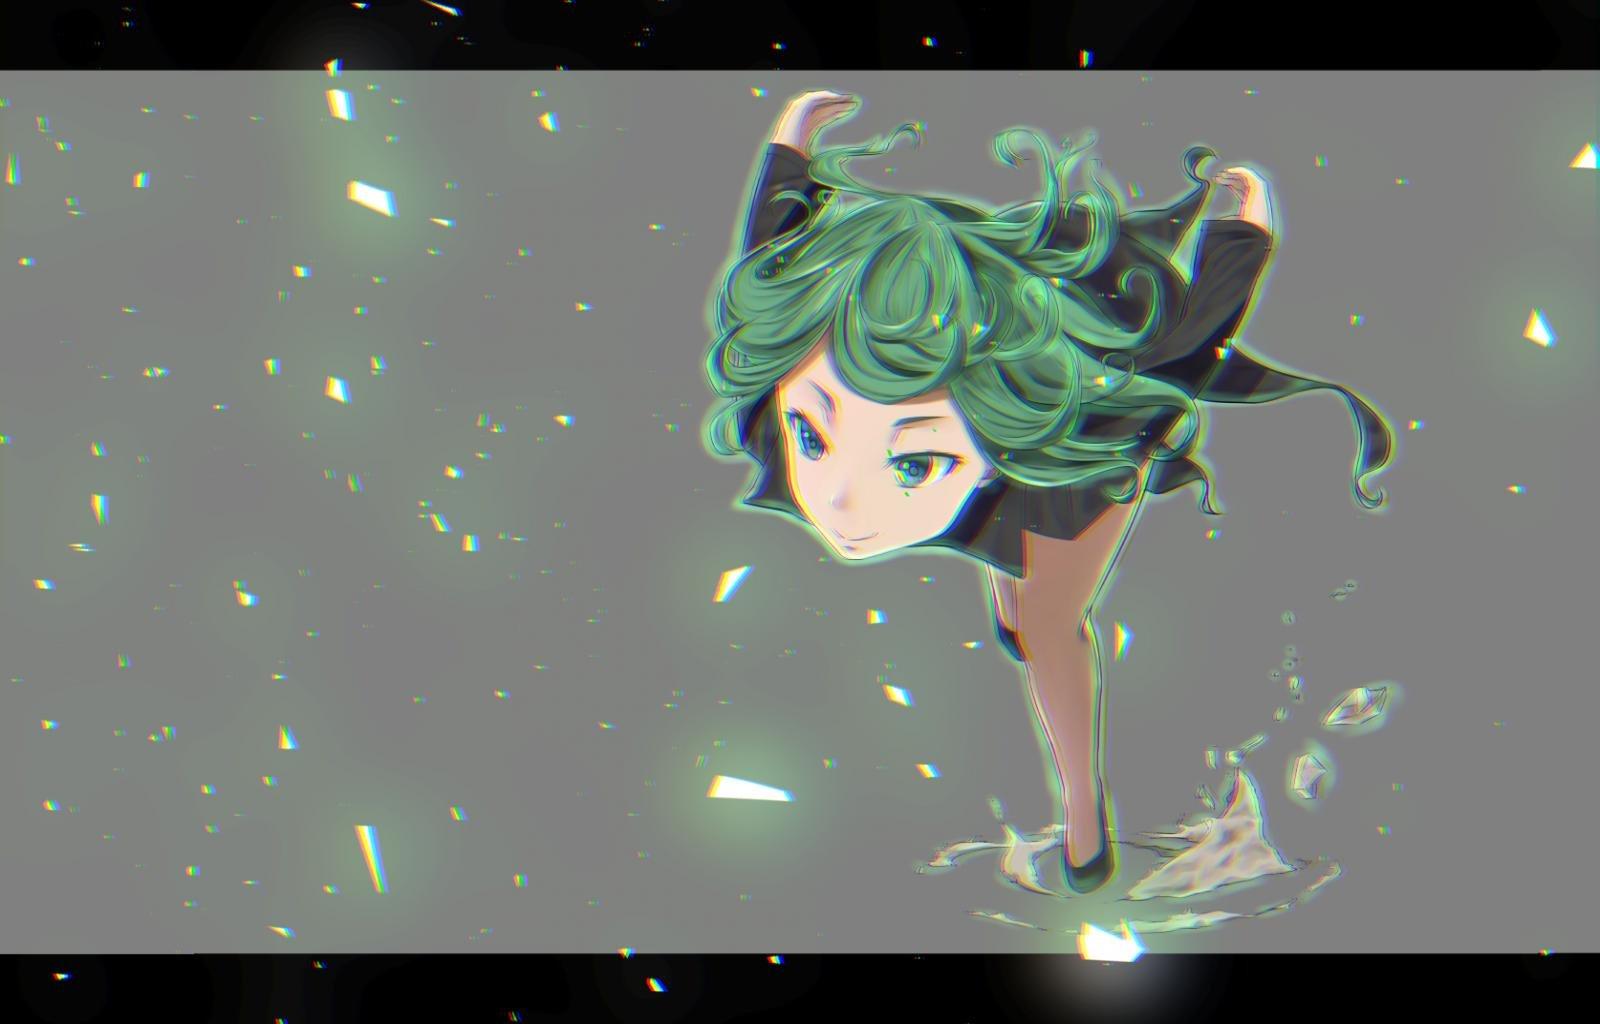 Tatsumaki One Punch Man Wallpapers Hd For Desktop Backgrounds